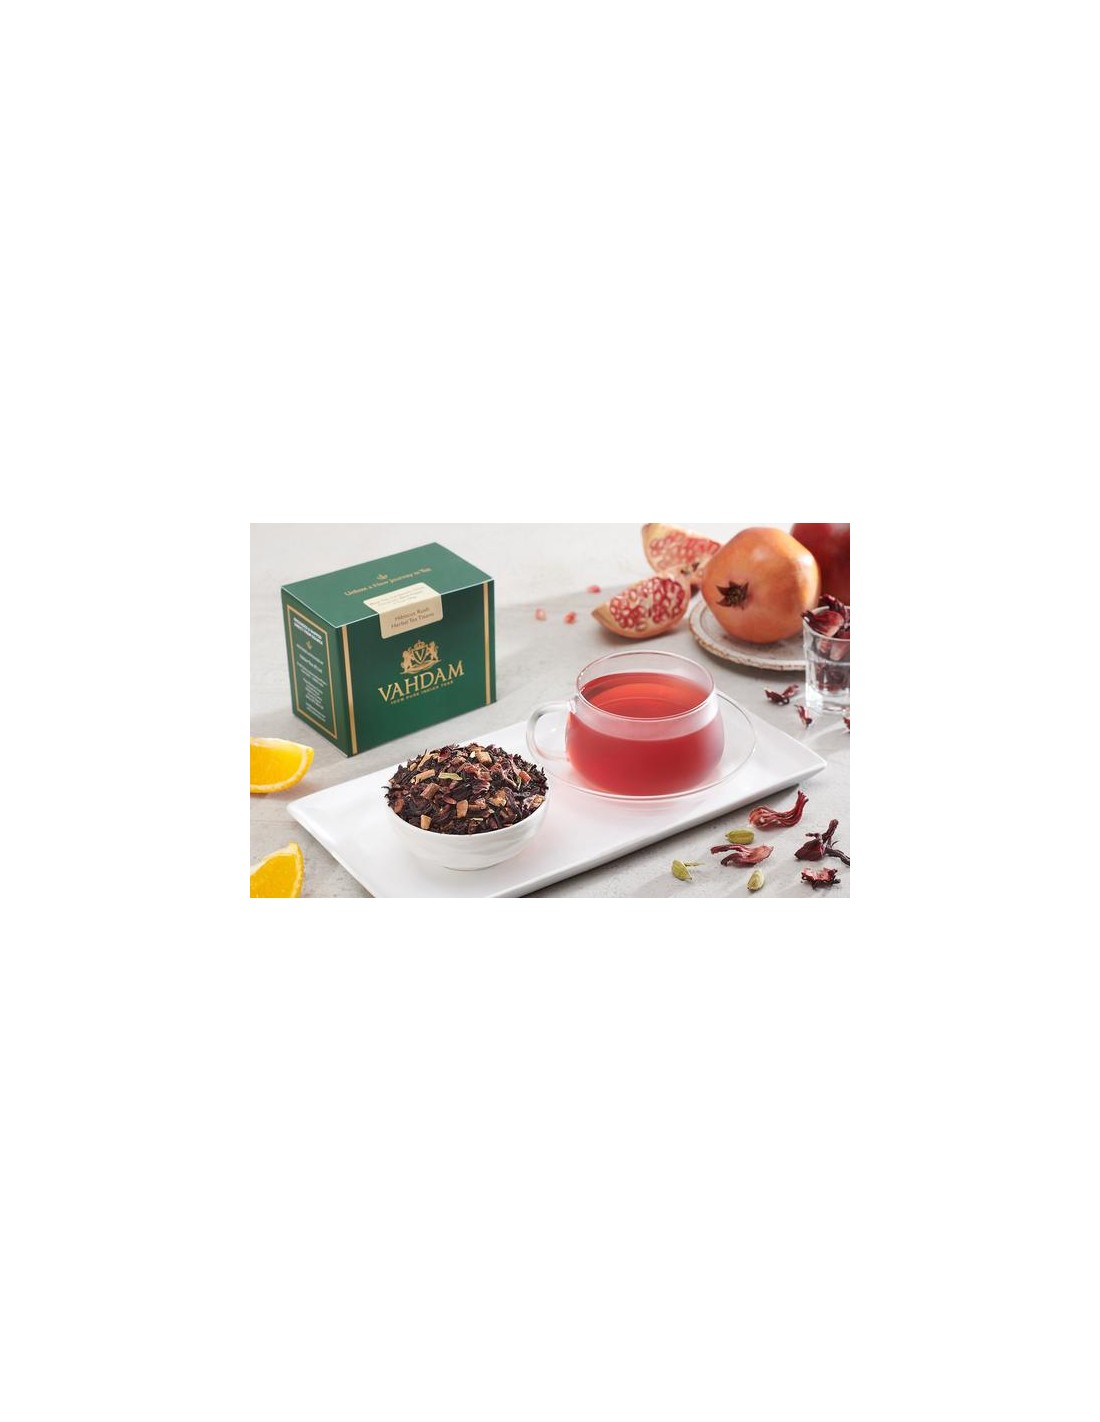 Hibiskus Rush Herbal Tea - Republika Smaków Sp. z o.o.